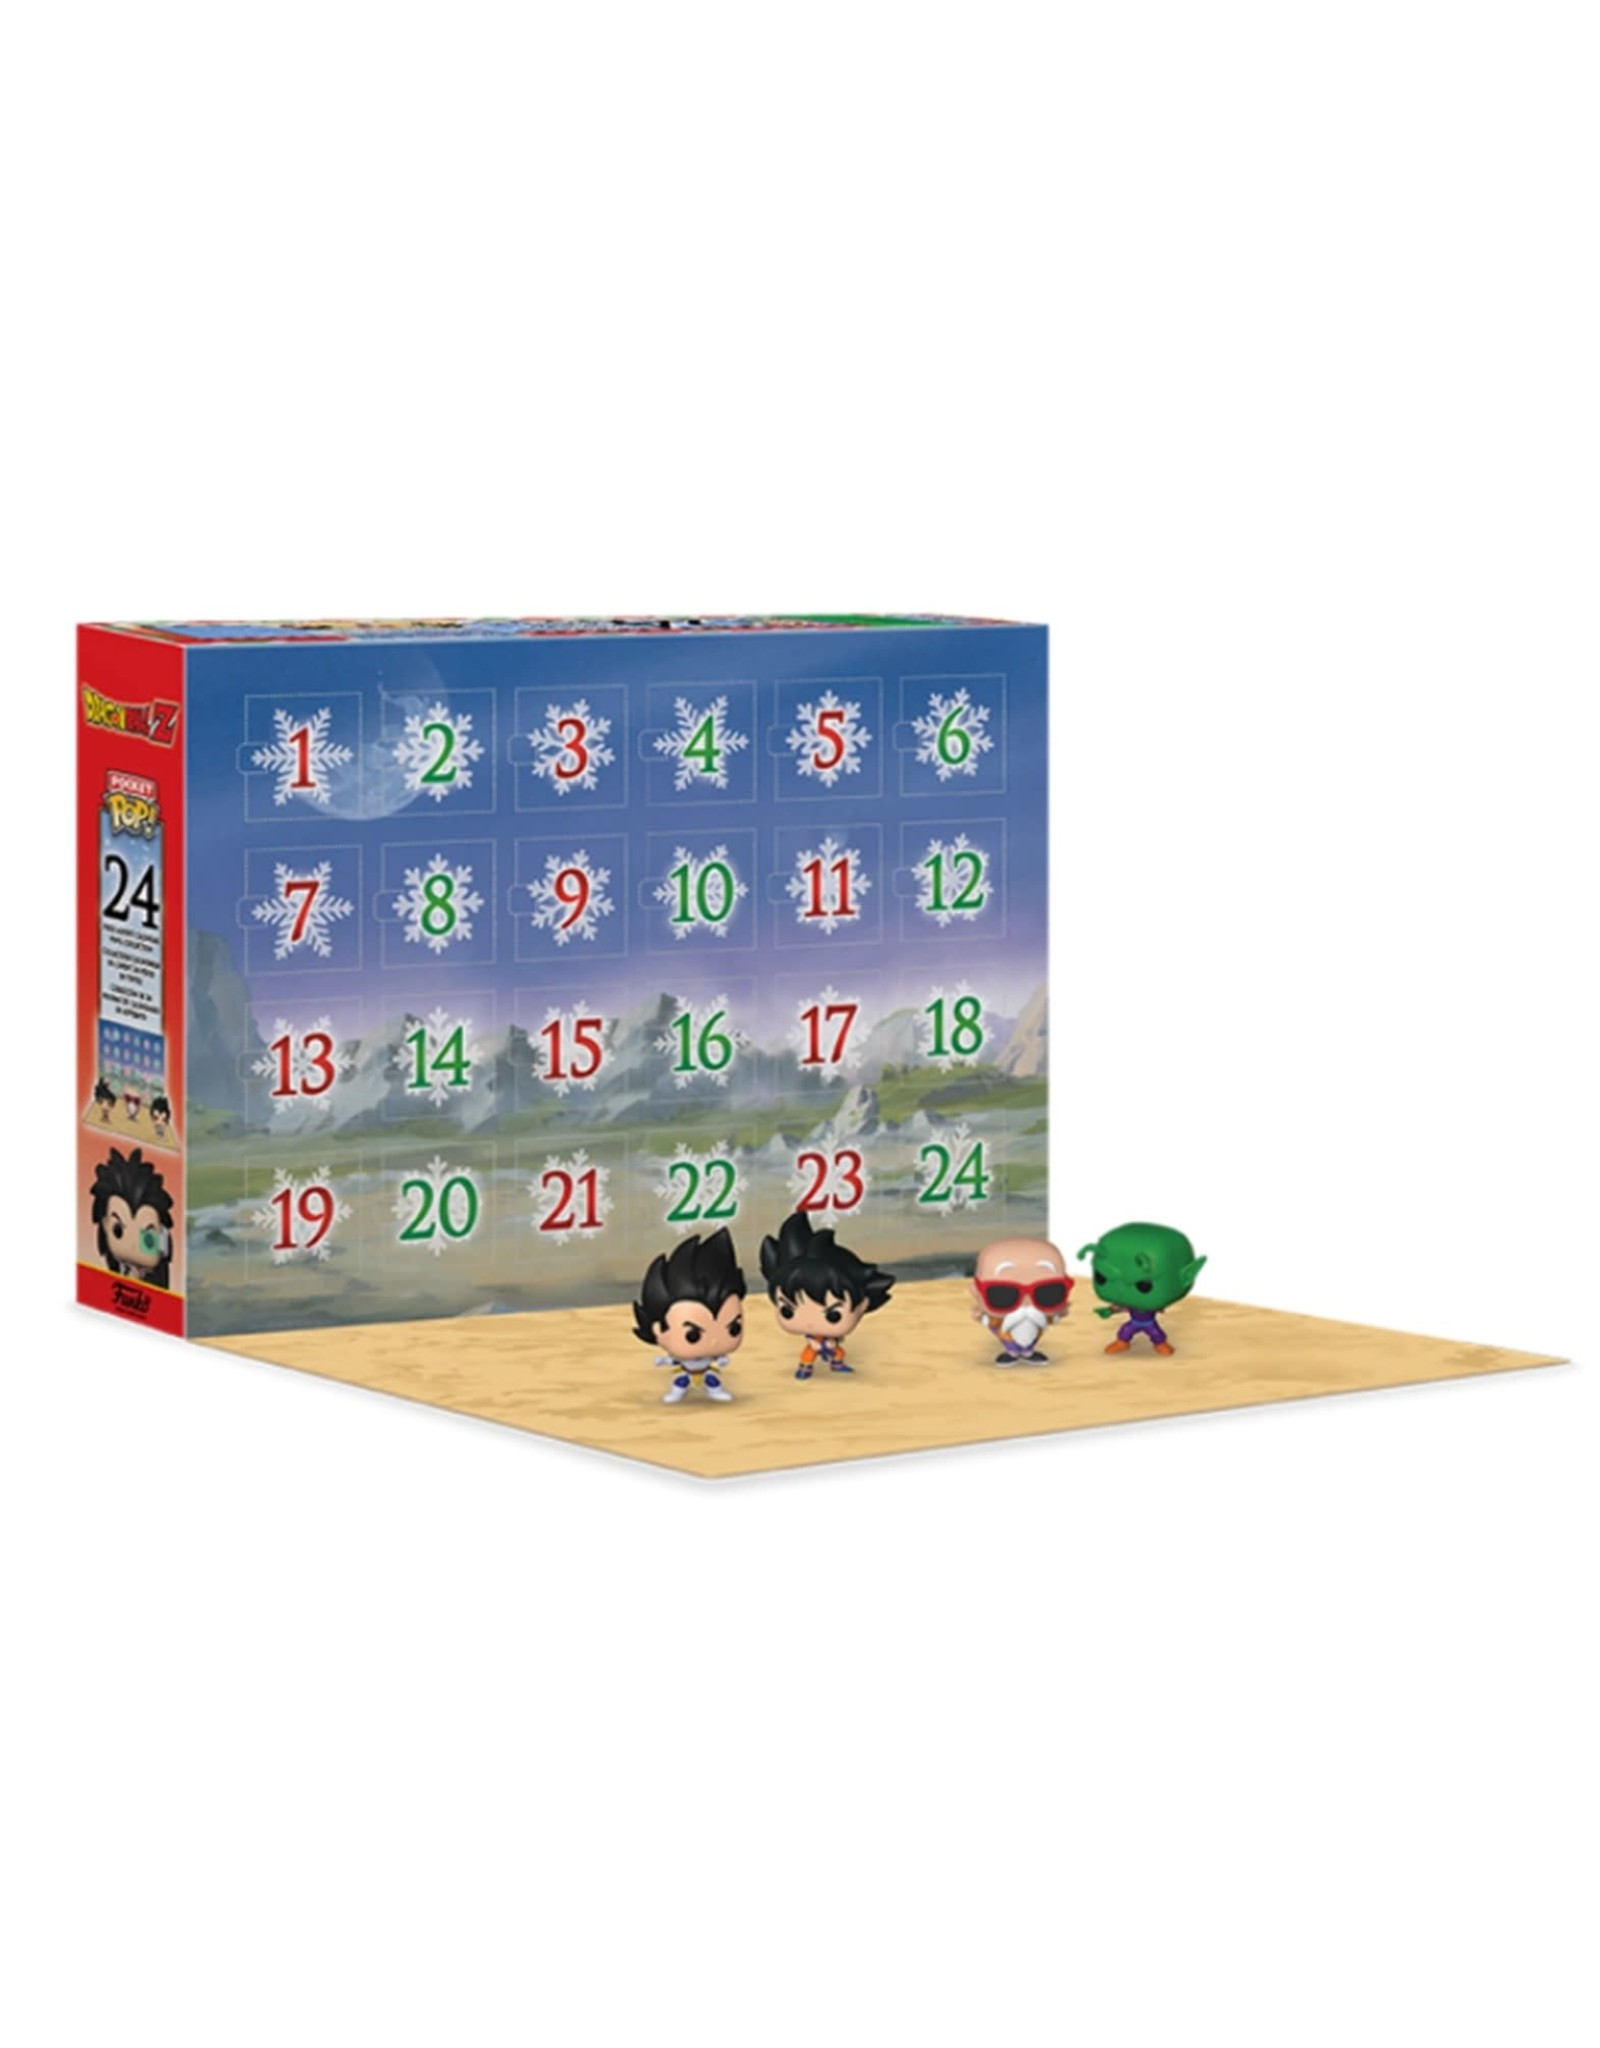 Dragon Ball Z Advent Calendar 2020